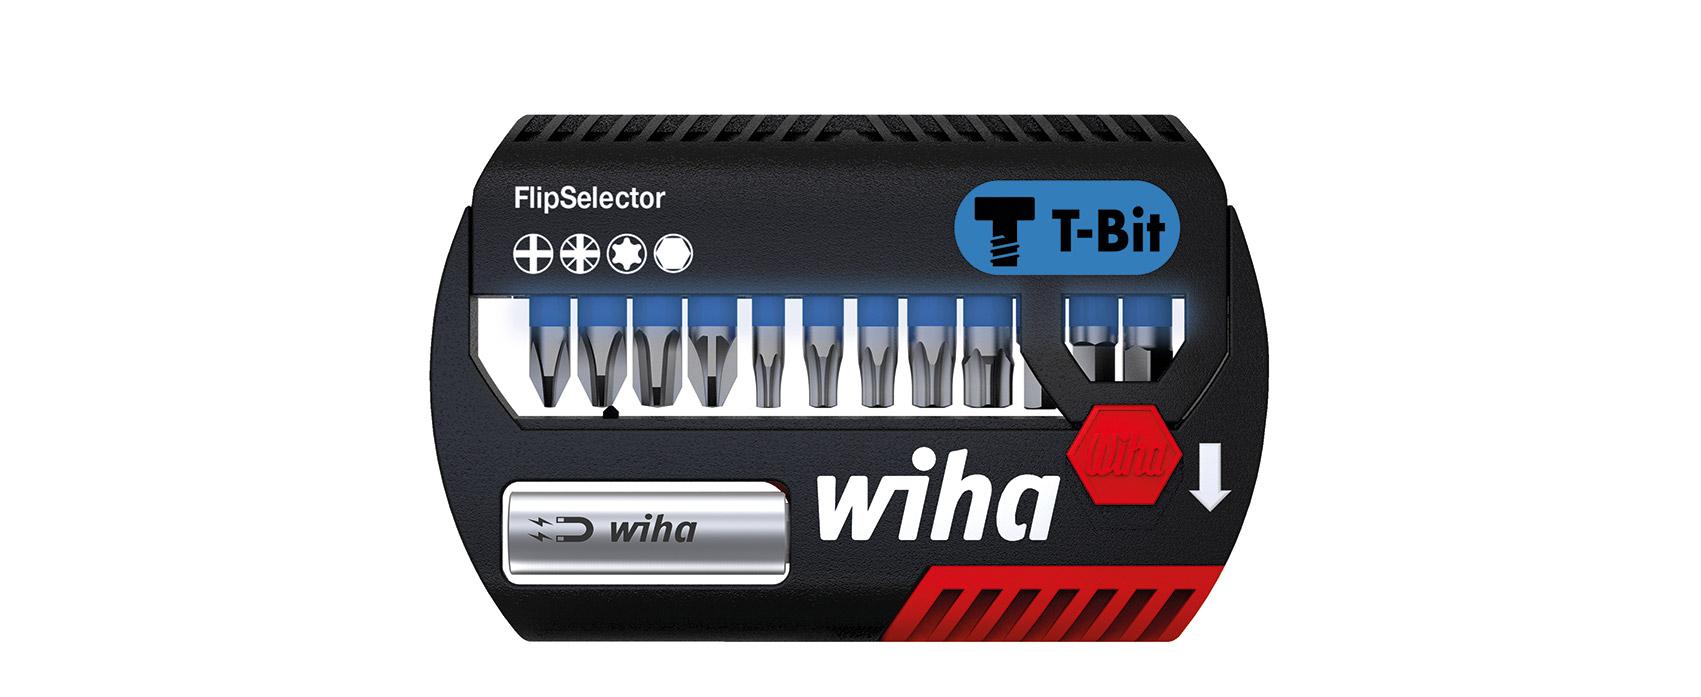 7947T999_FlipSelector-T_PH-PZ-Torx-SW_KatC